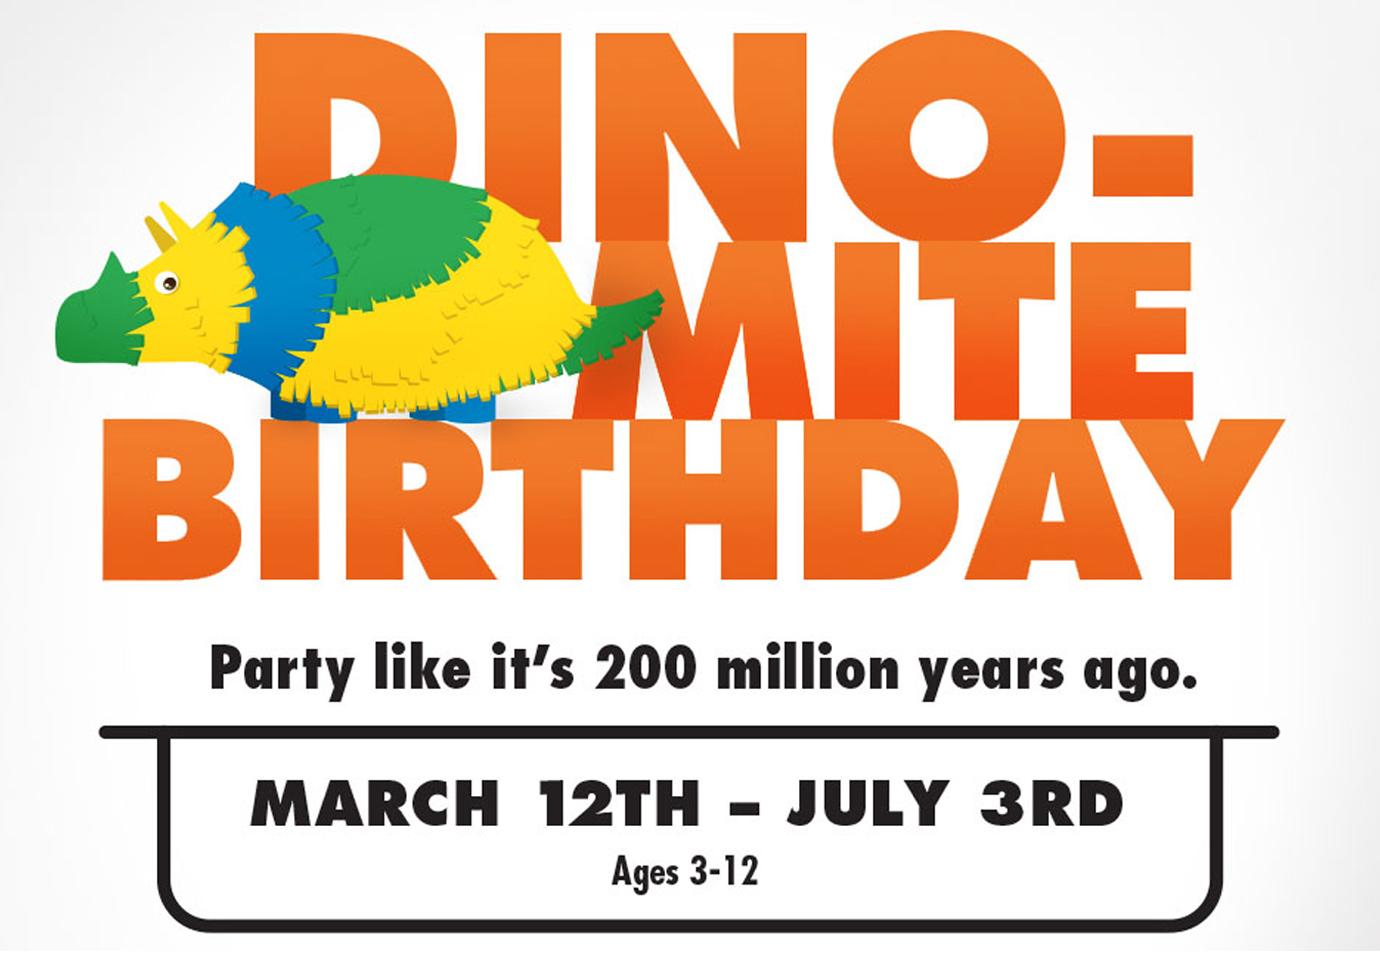 Dino-mite Birthdays at the Jacksonville Zoo